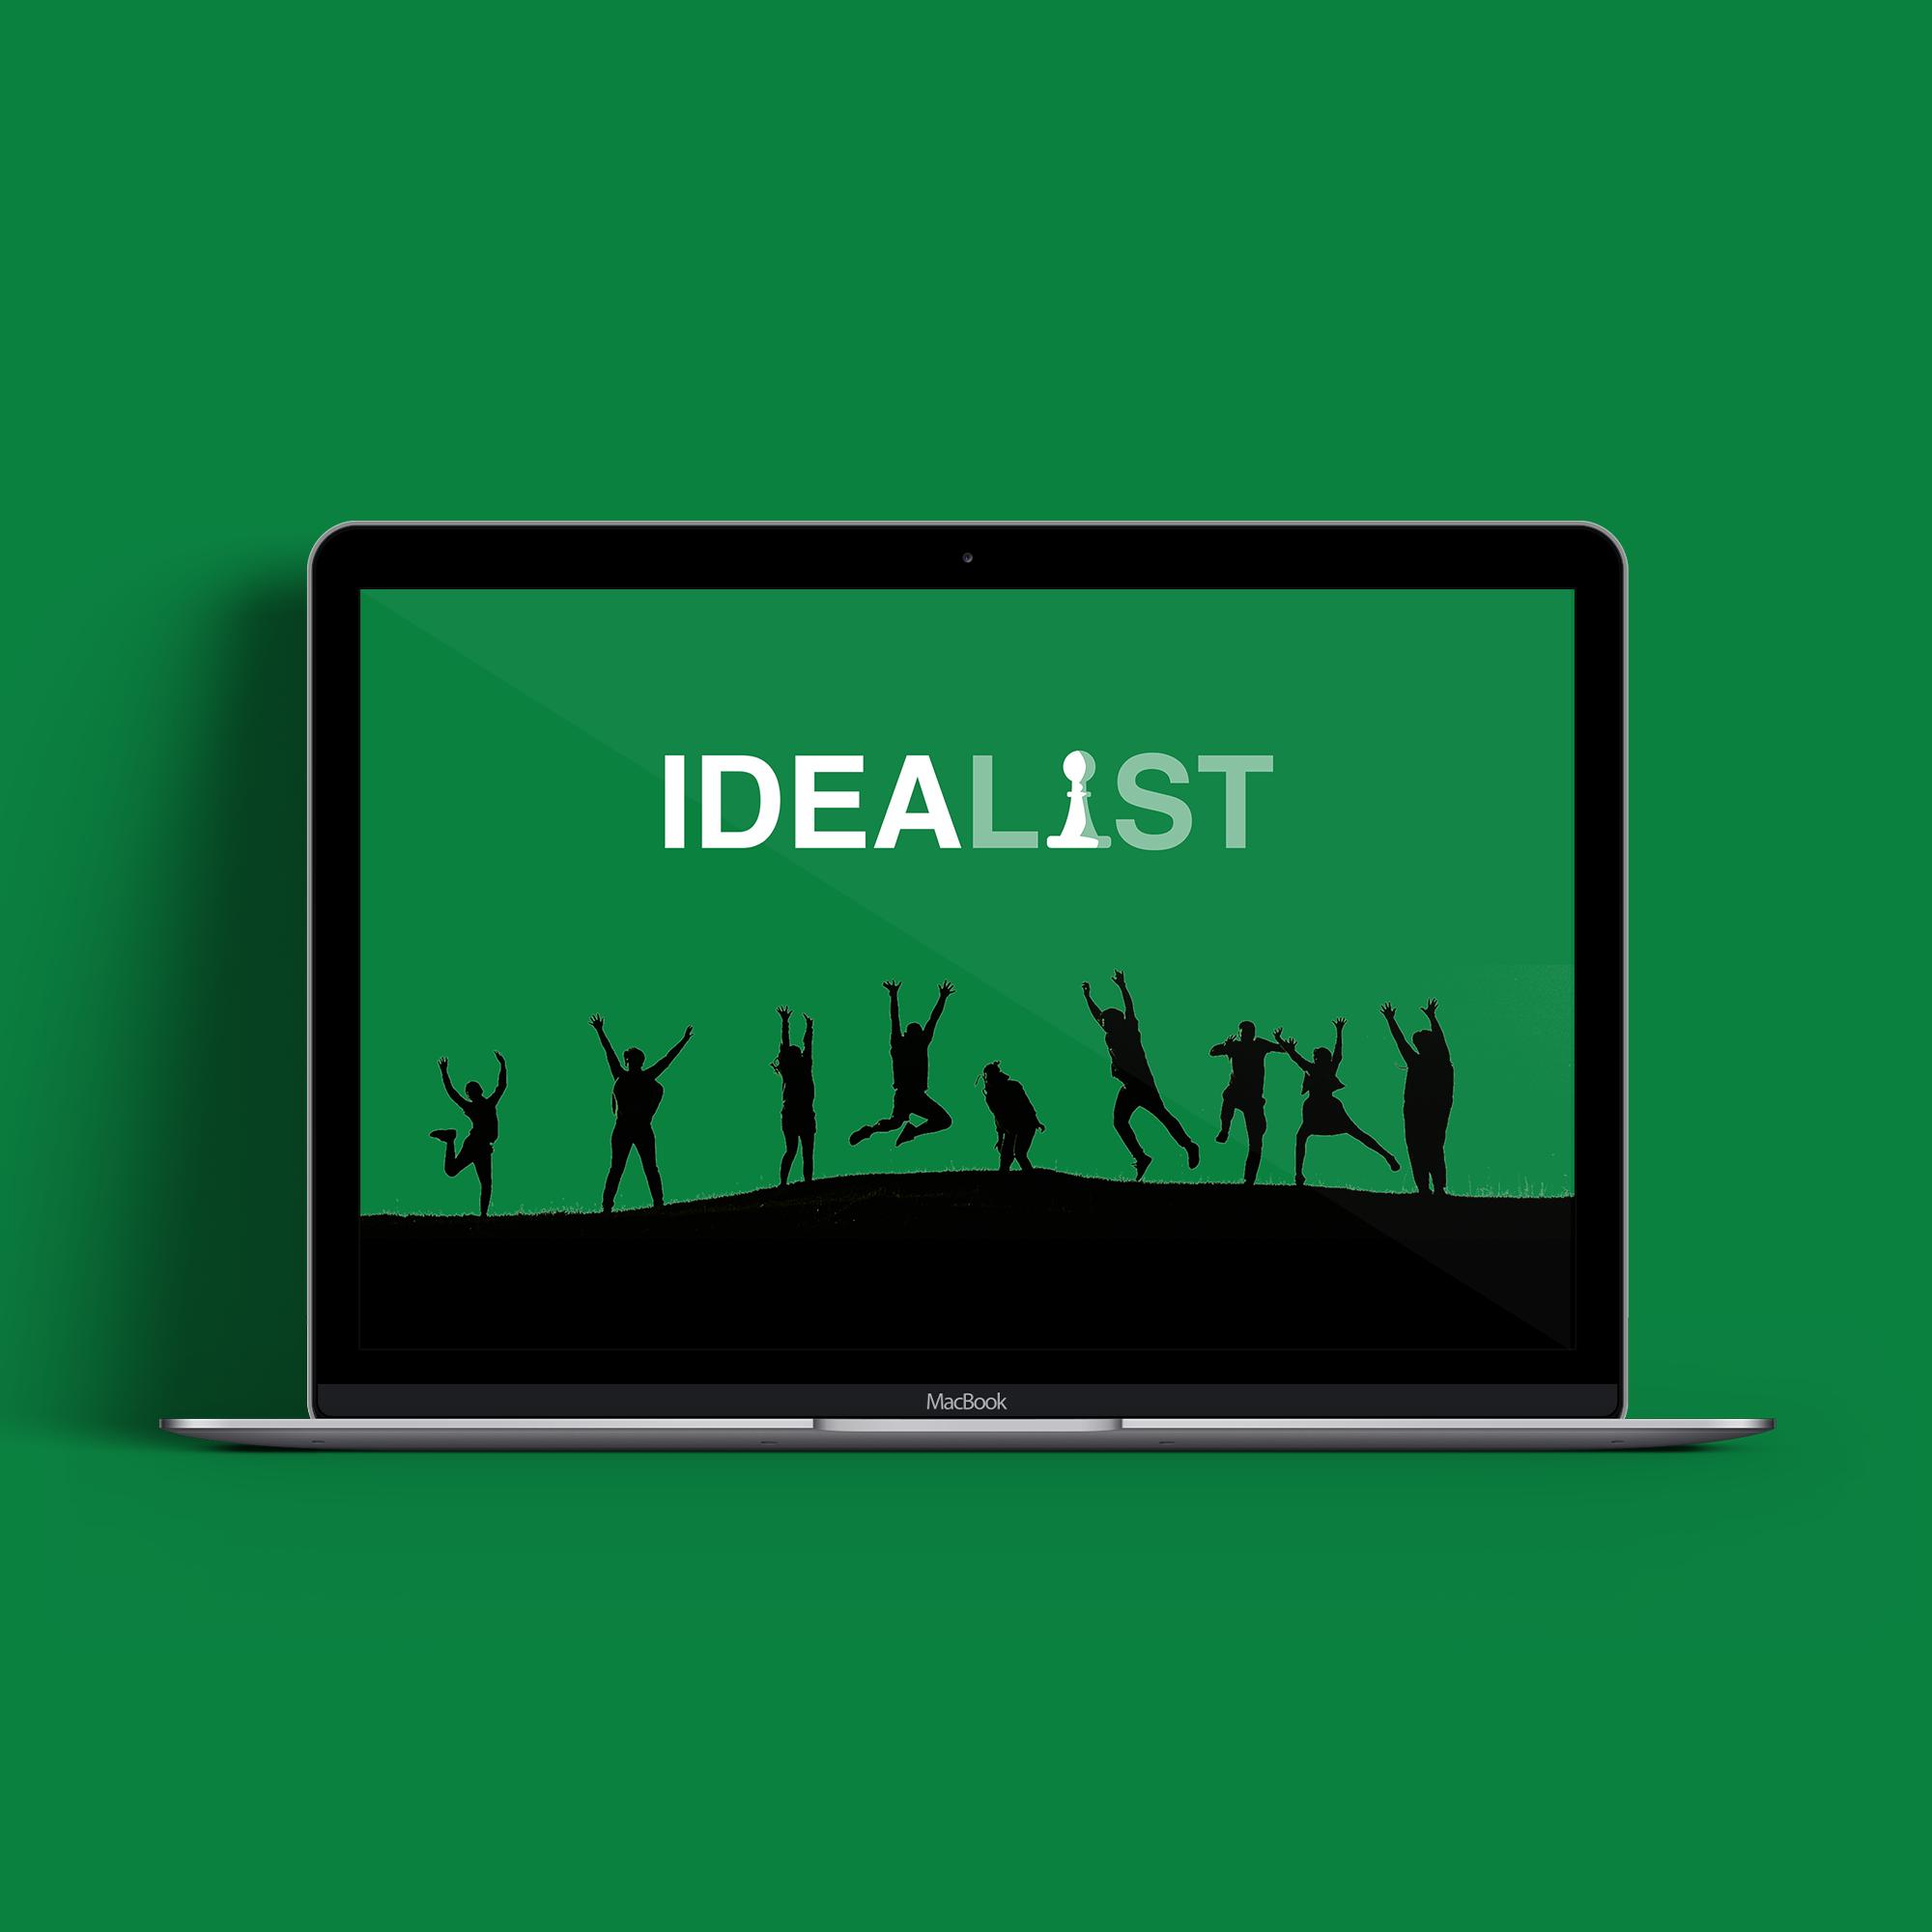 jason-b-graham-web-design-idealist-featured-image